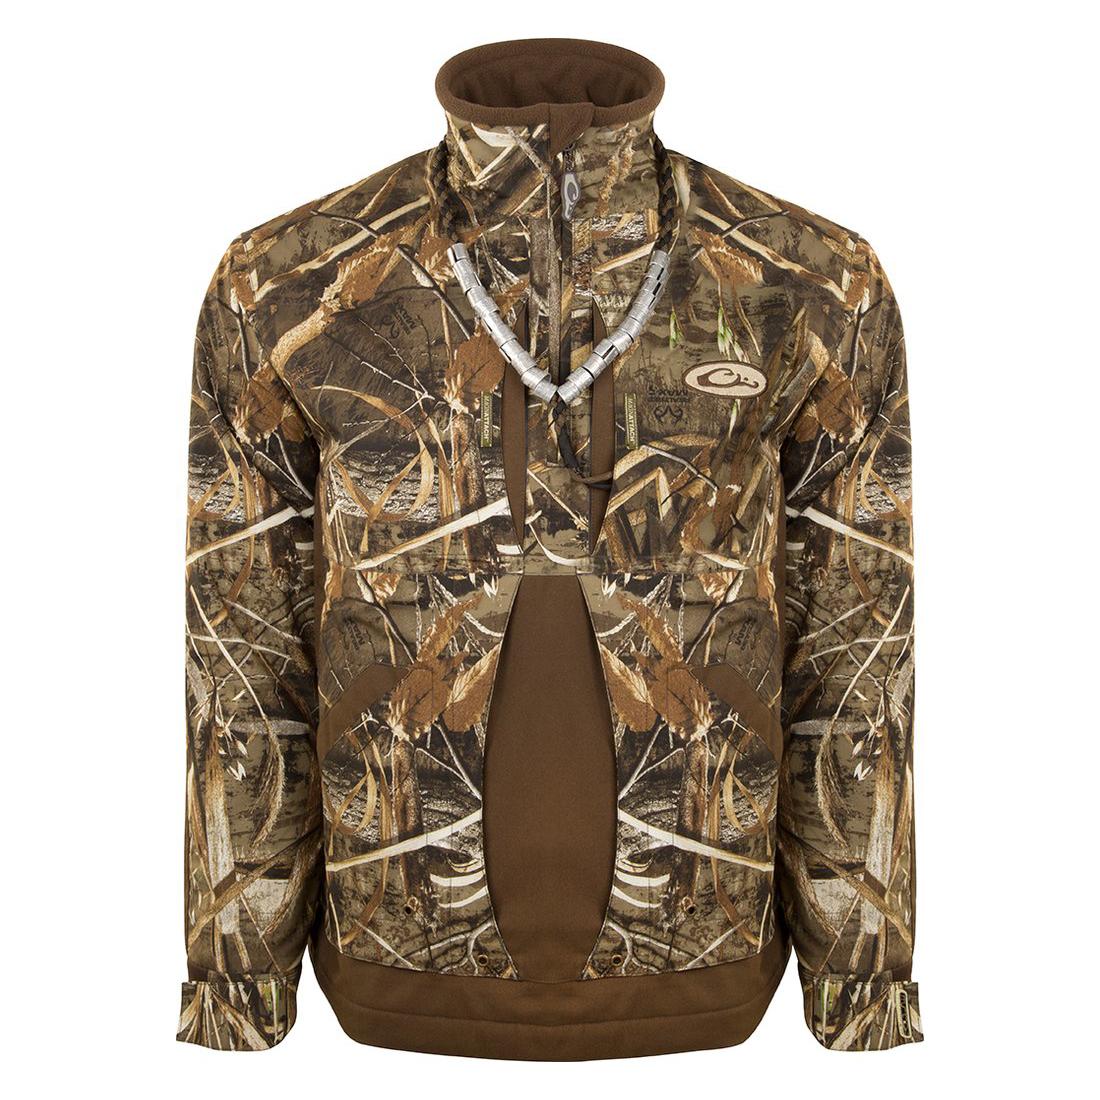 743737e21 Drake Waterfowl Men s Guardian Flex Fleece-Lined Quarter-Zip Jacket